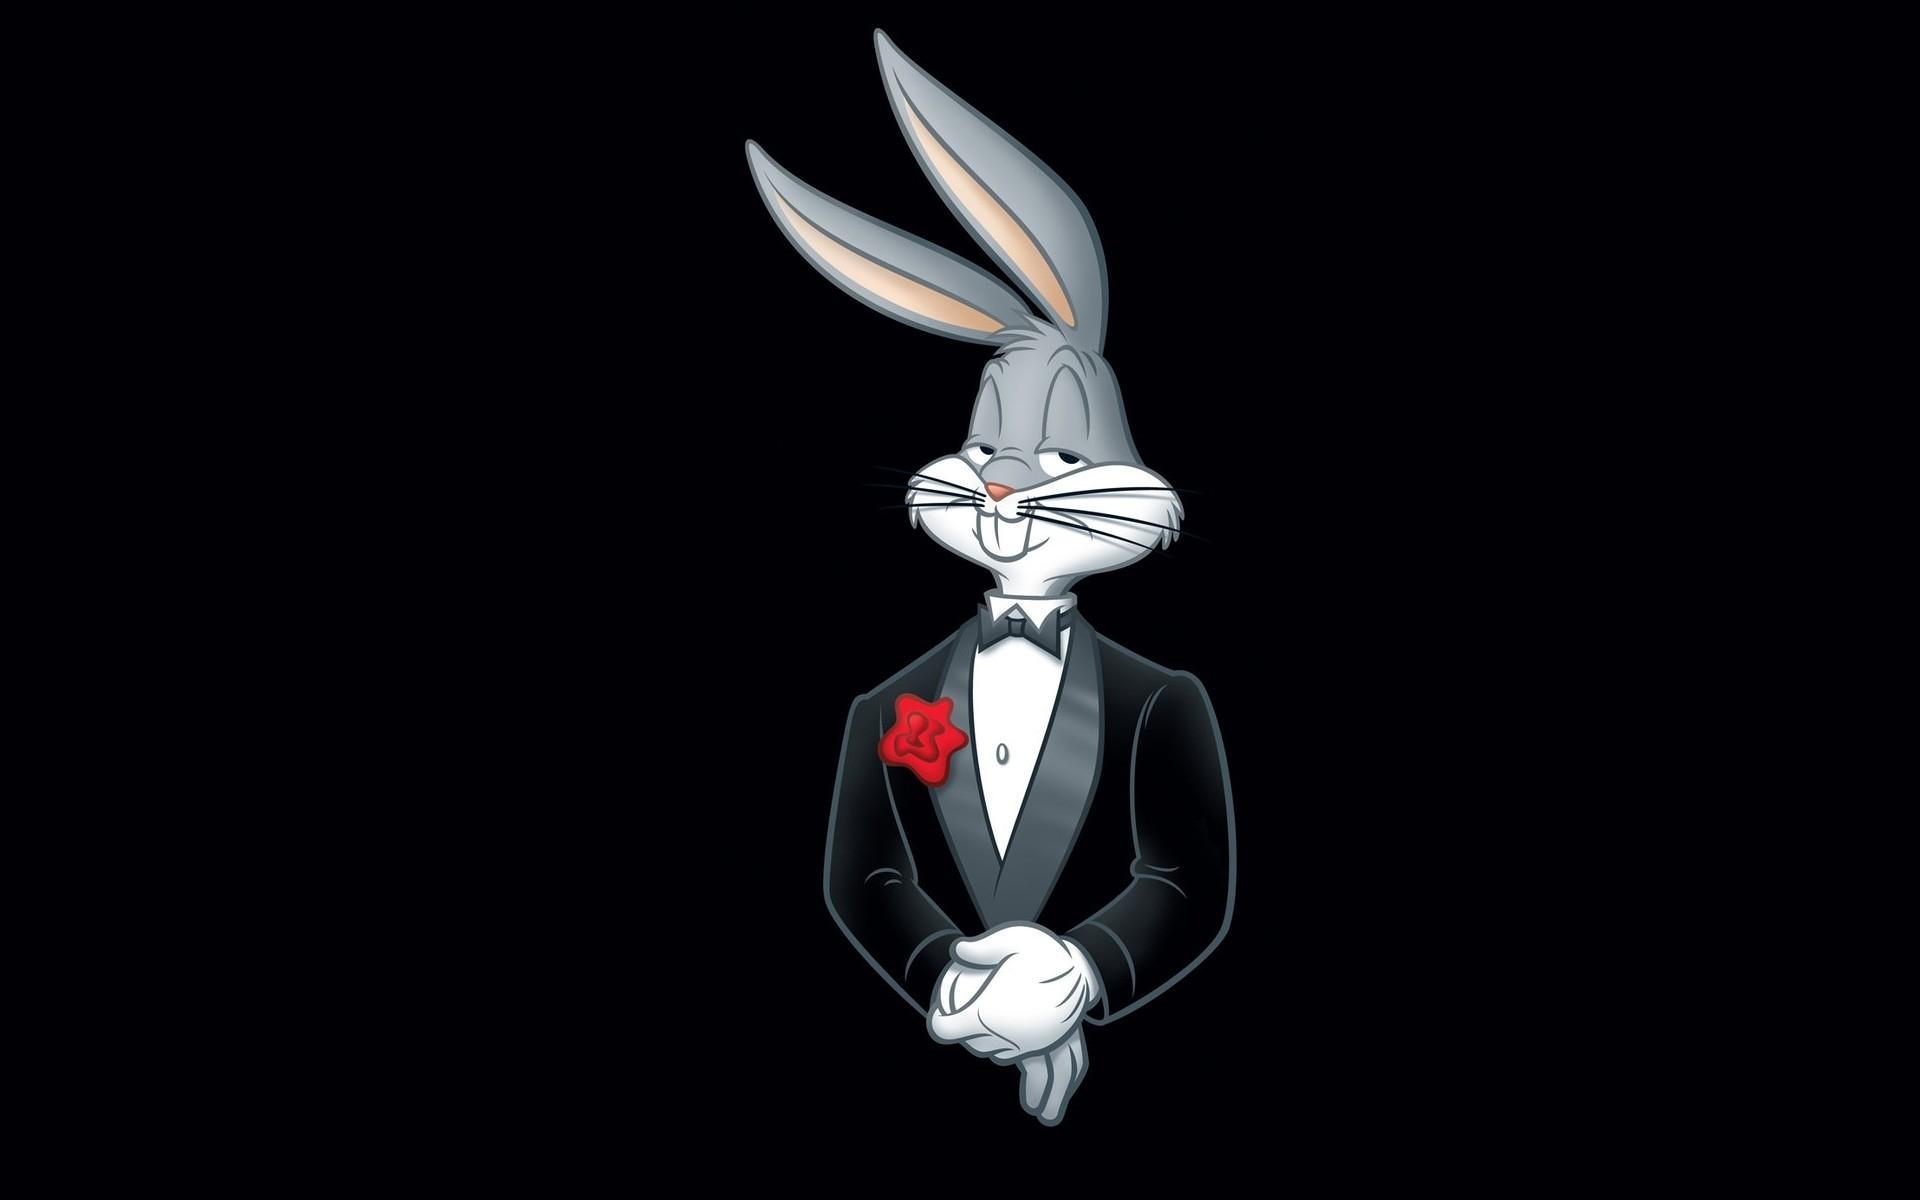 Bugs Bunny wallpaper #29775